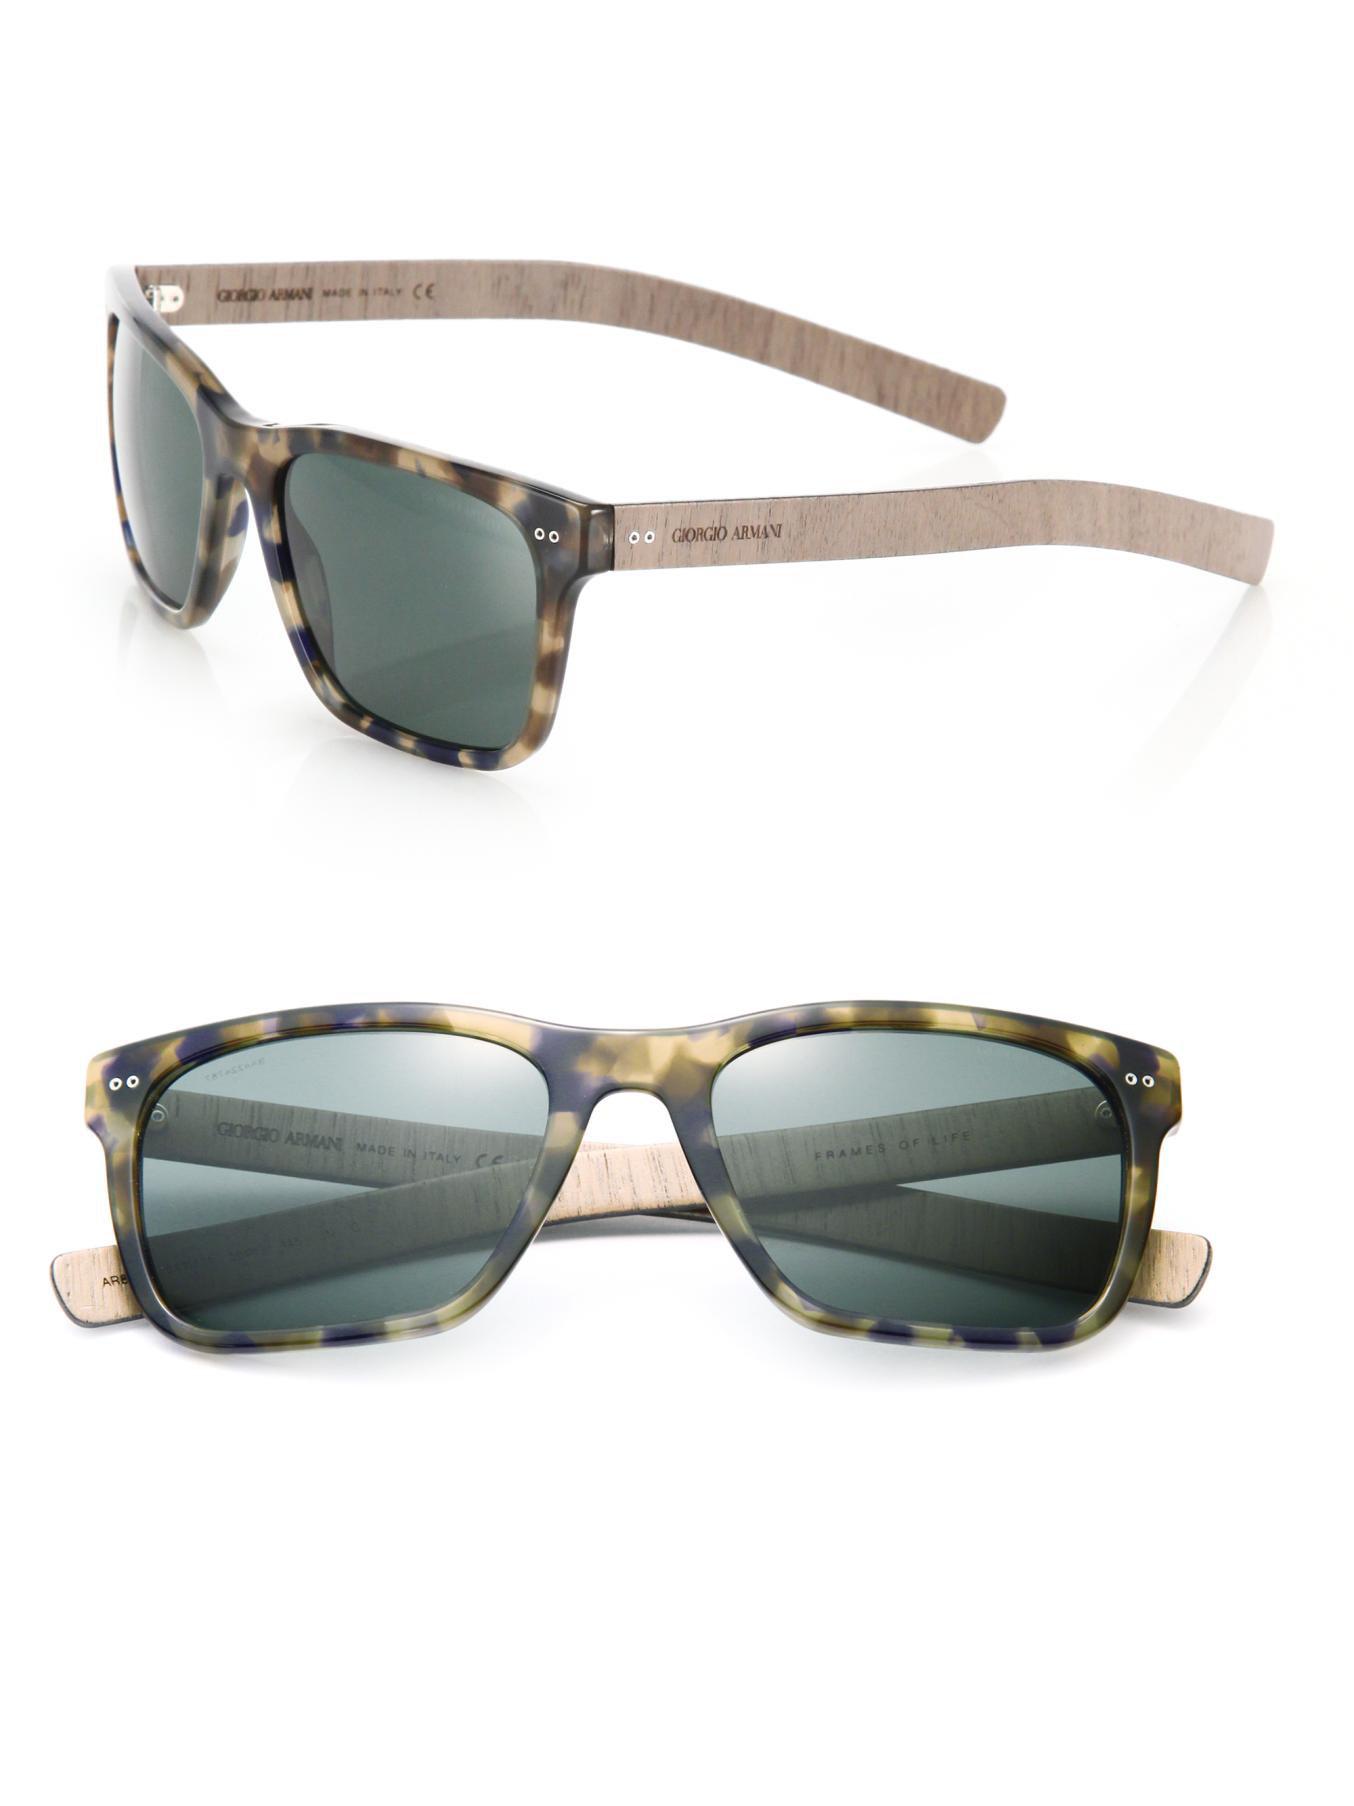 dbb41eaf367b Armani Sunglasses Mens 2015